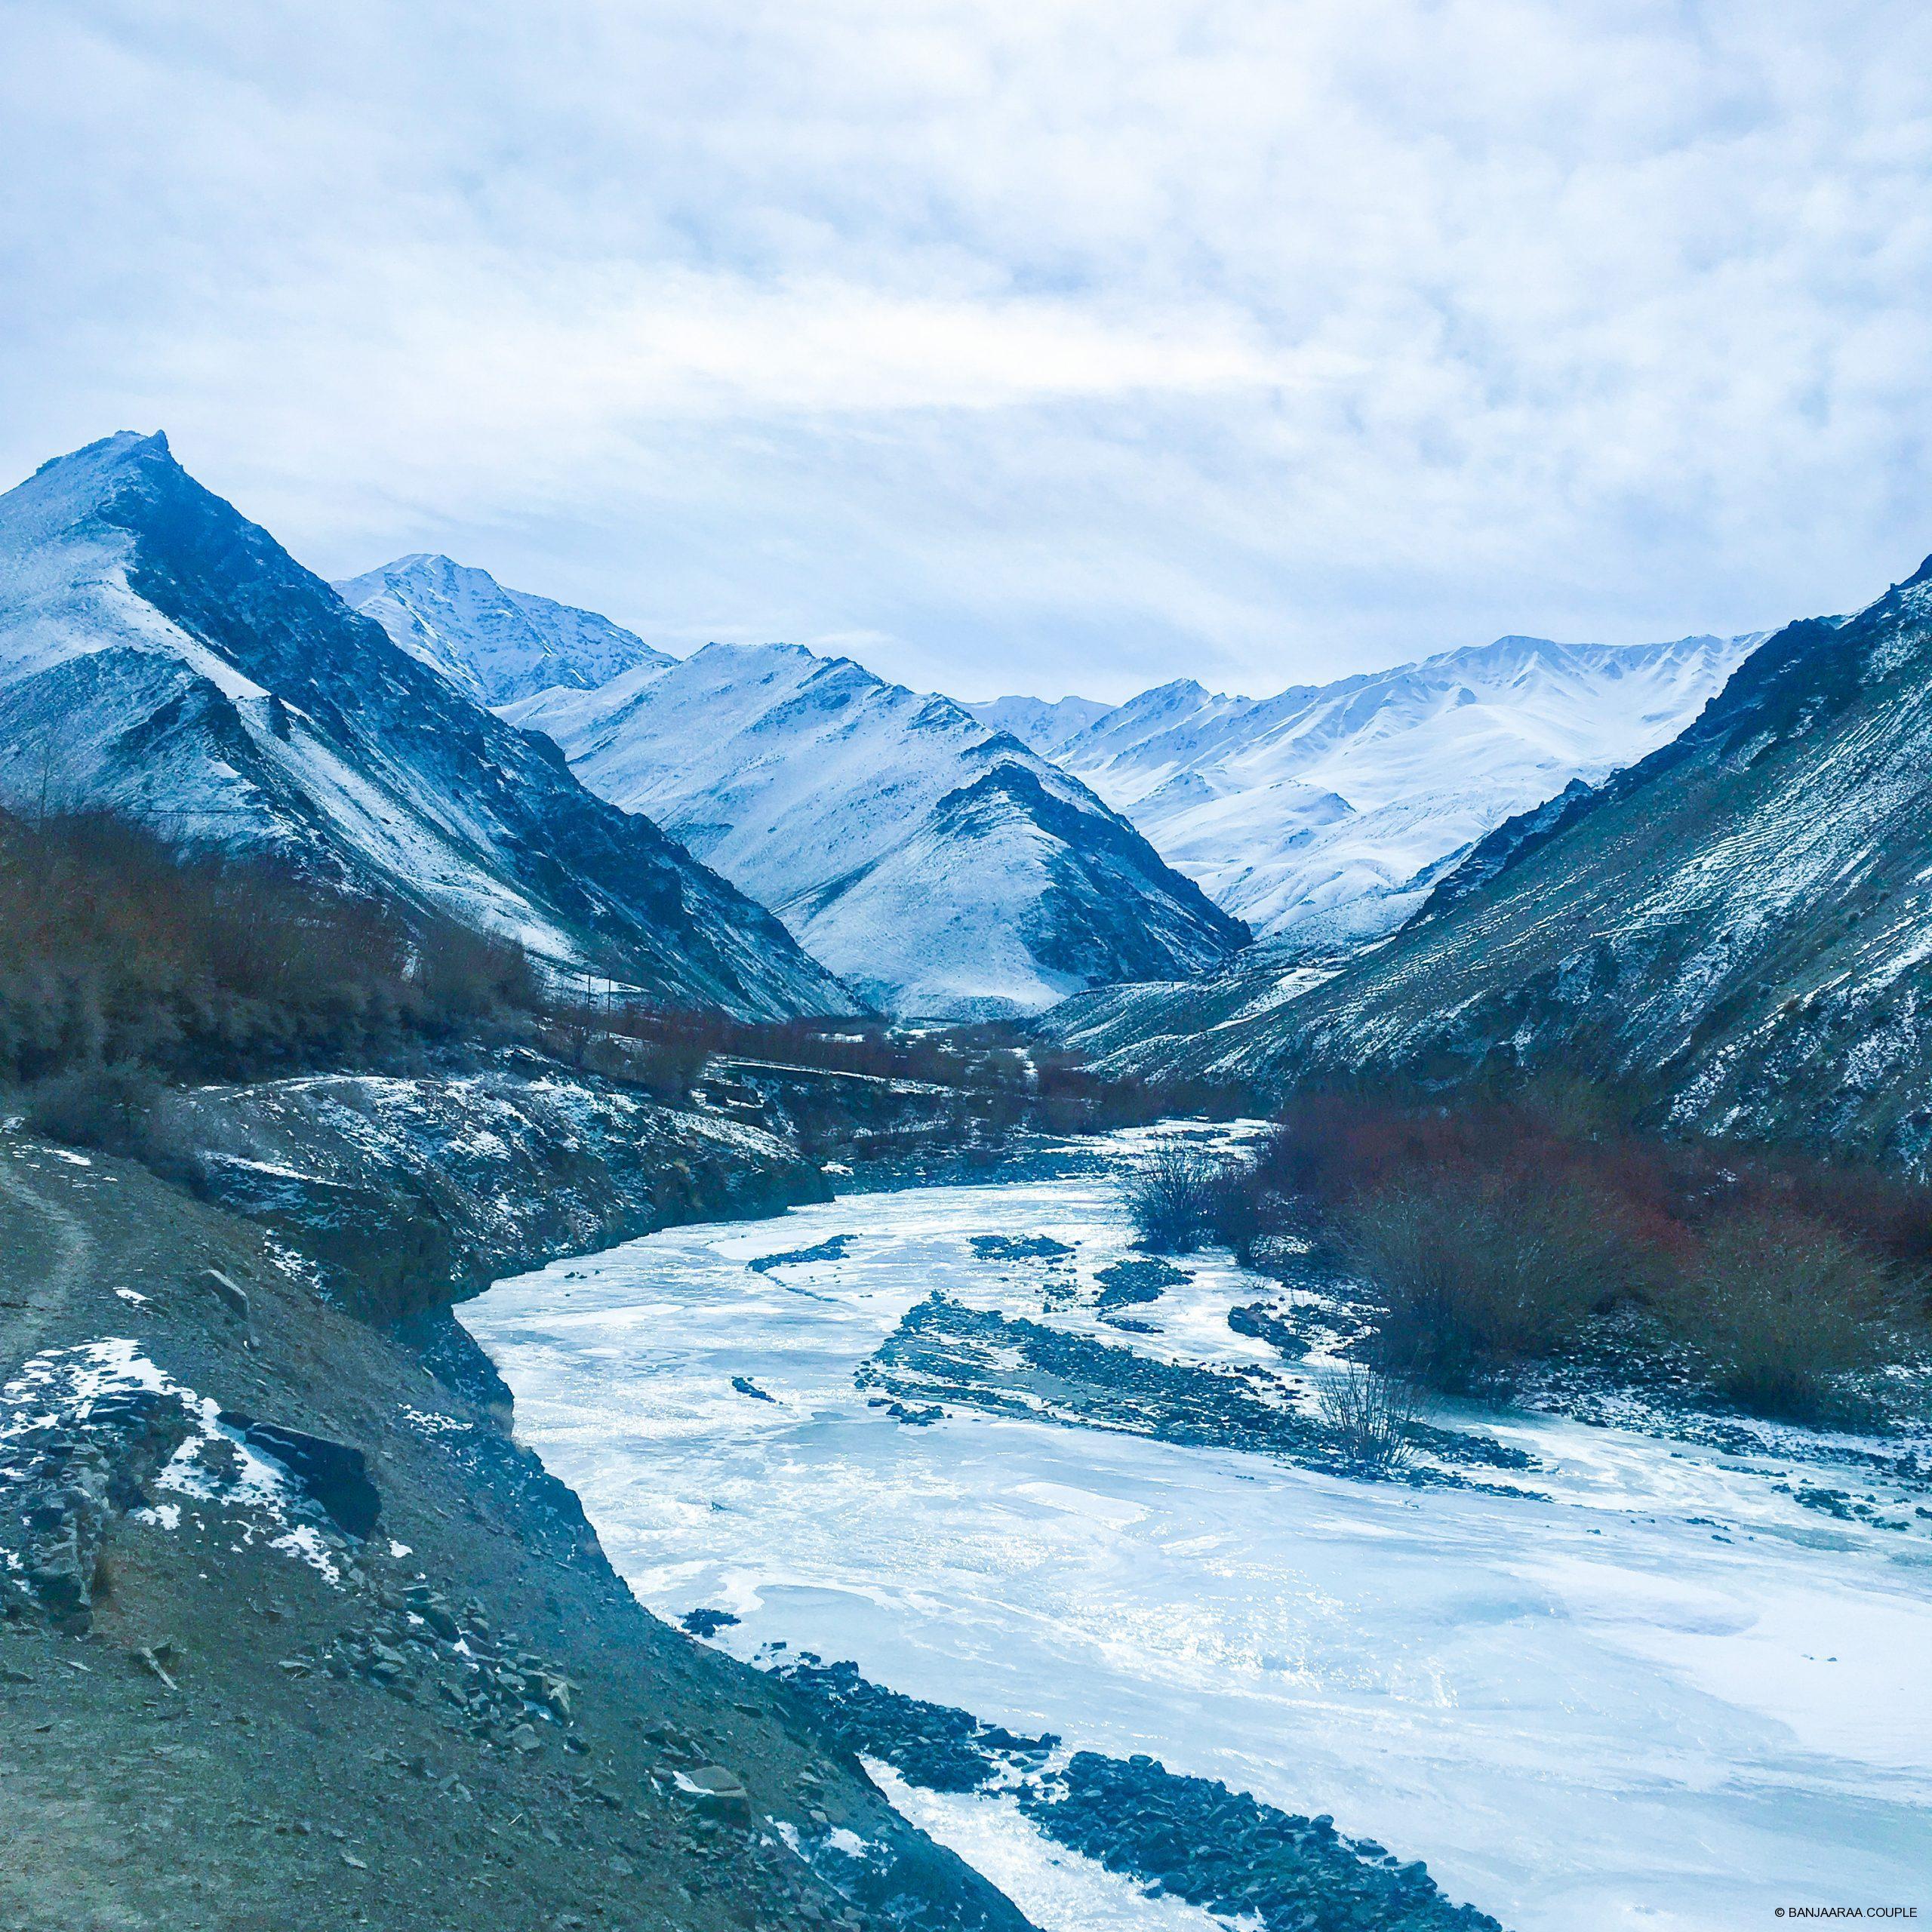 Frozen River inside the Hemis Park